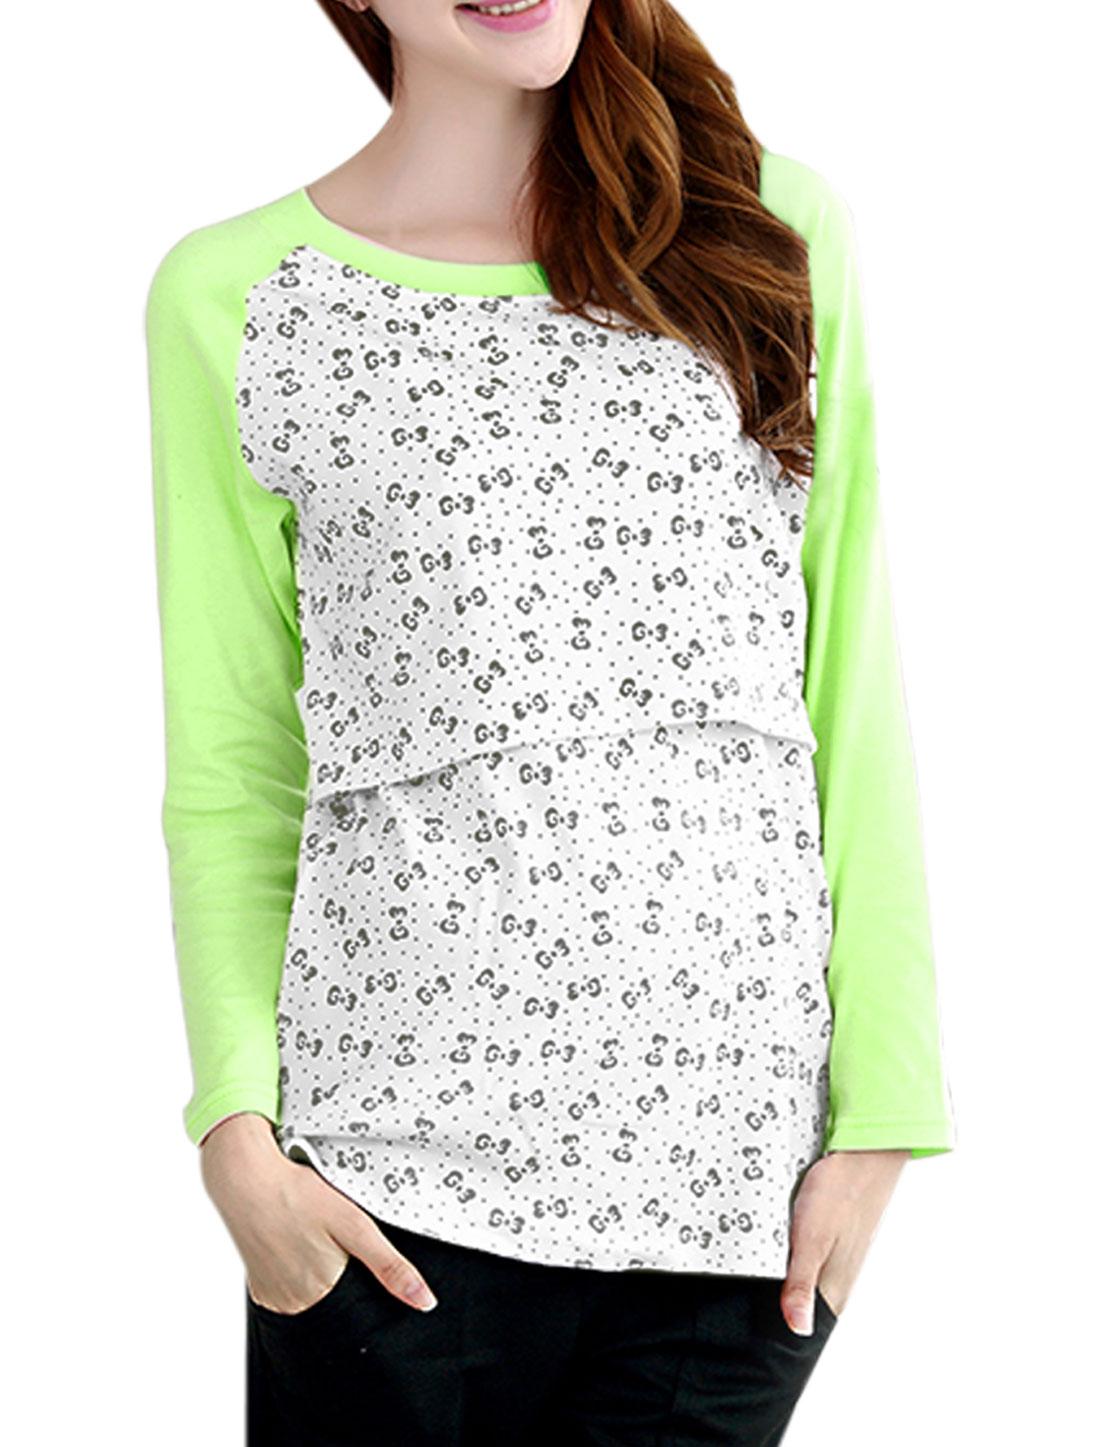 XK166 Motherhood Long Raglan Sleeves Fake Two Pieces NEW Shirt Light Green White XXL/M (US 10)